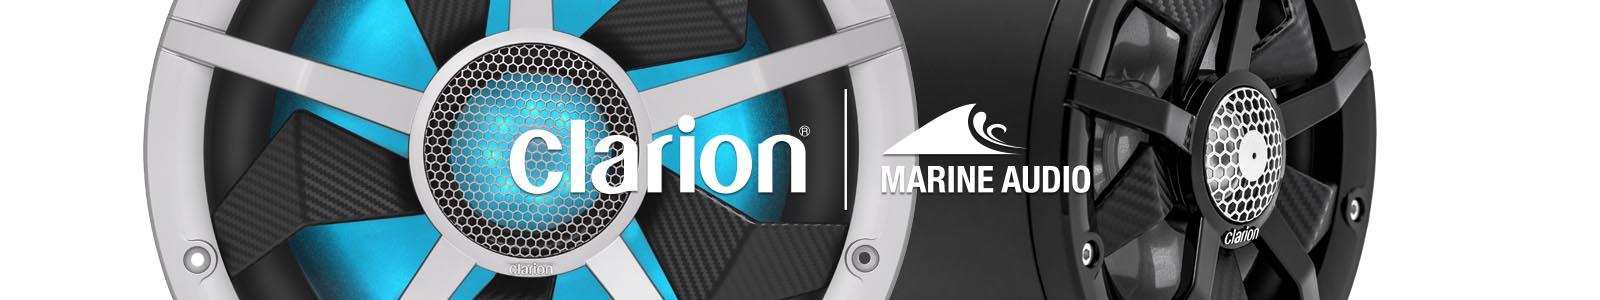 Clarion Sale! Save huge on amazing clarion marine audio equipment!